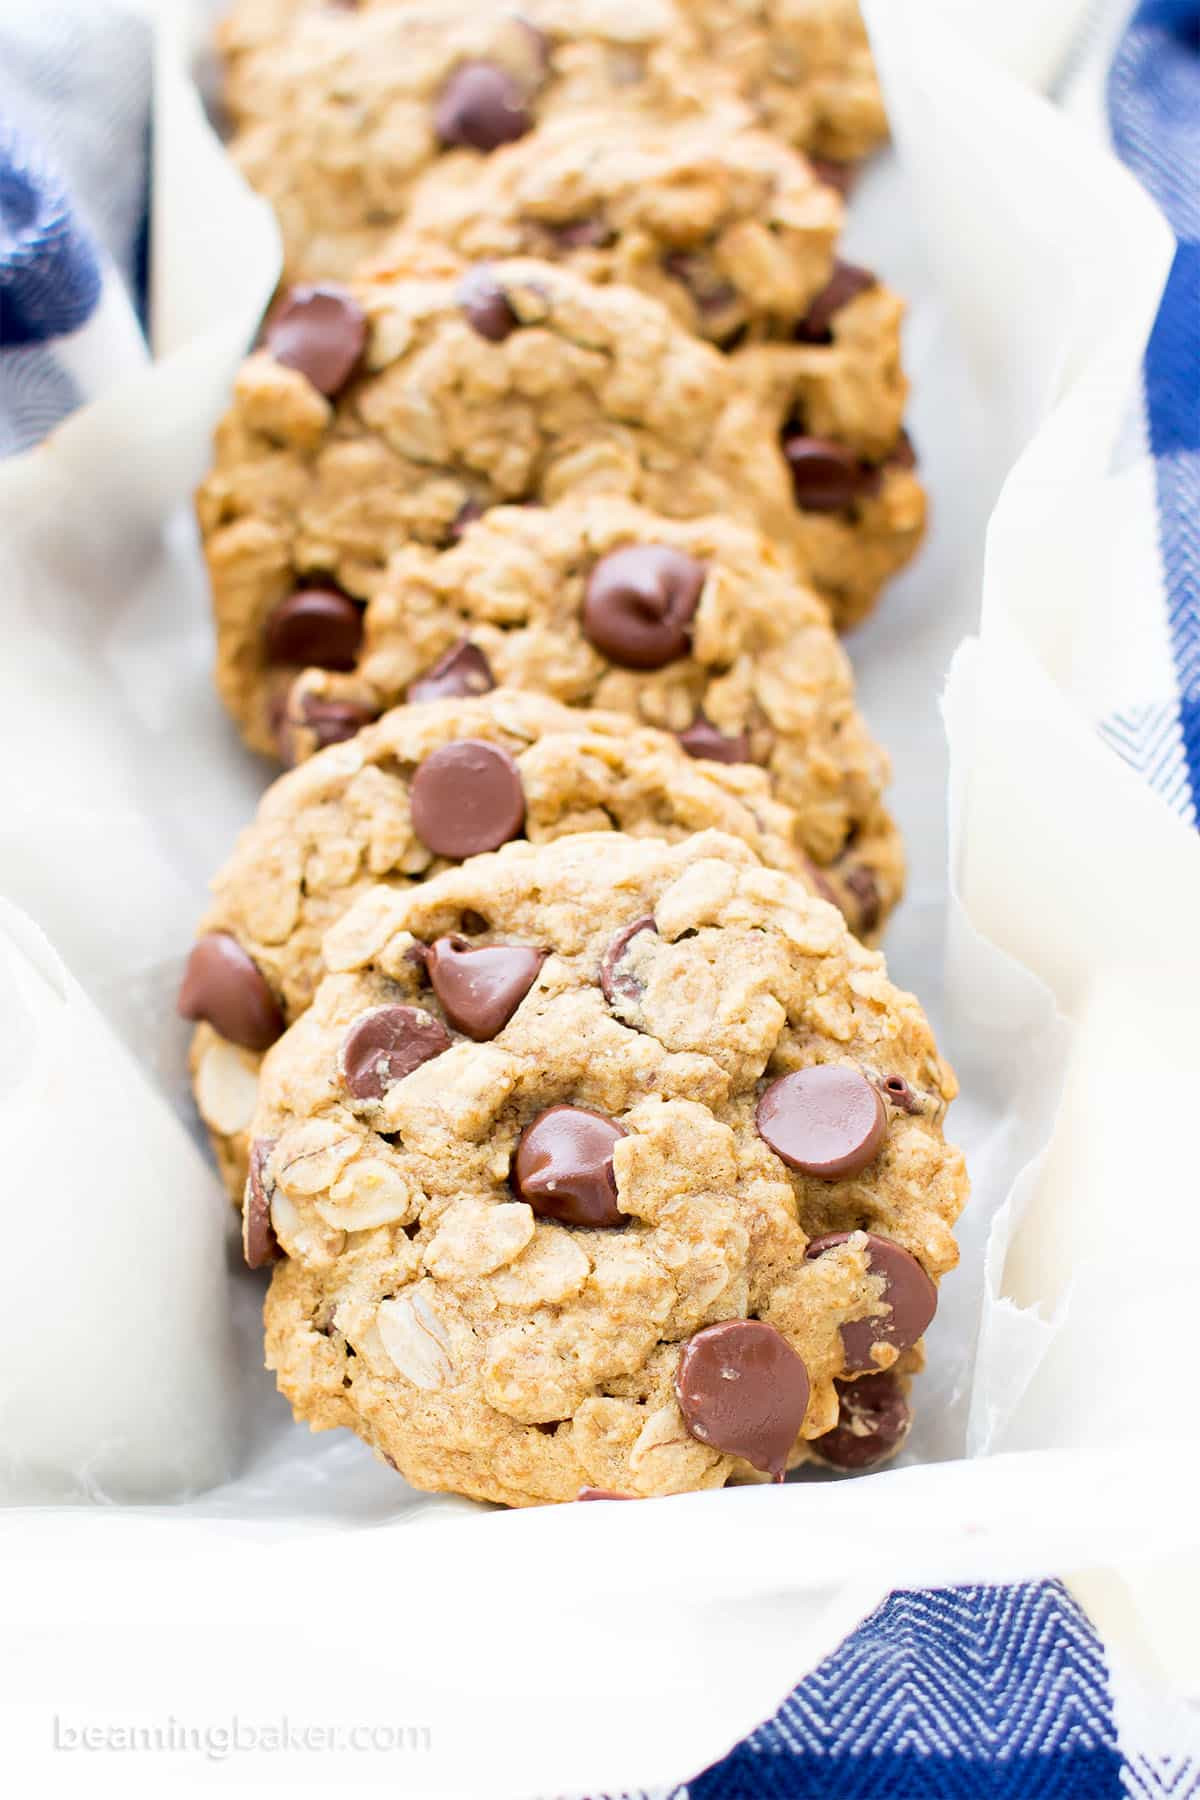 Vegan Oatmeal Chocolate Chip Cookies  Gluten Free Vegan Oatmeal Chocolate Chip Cookies V GF